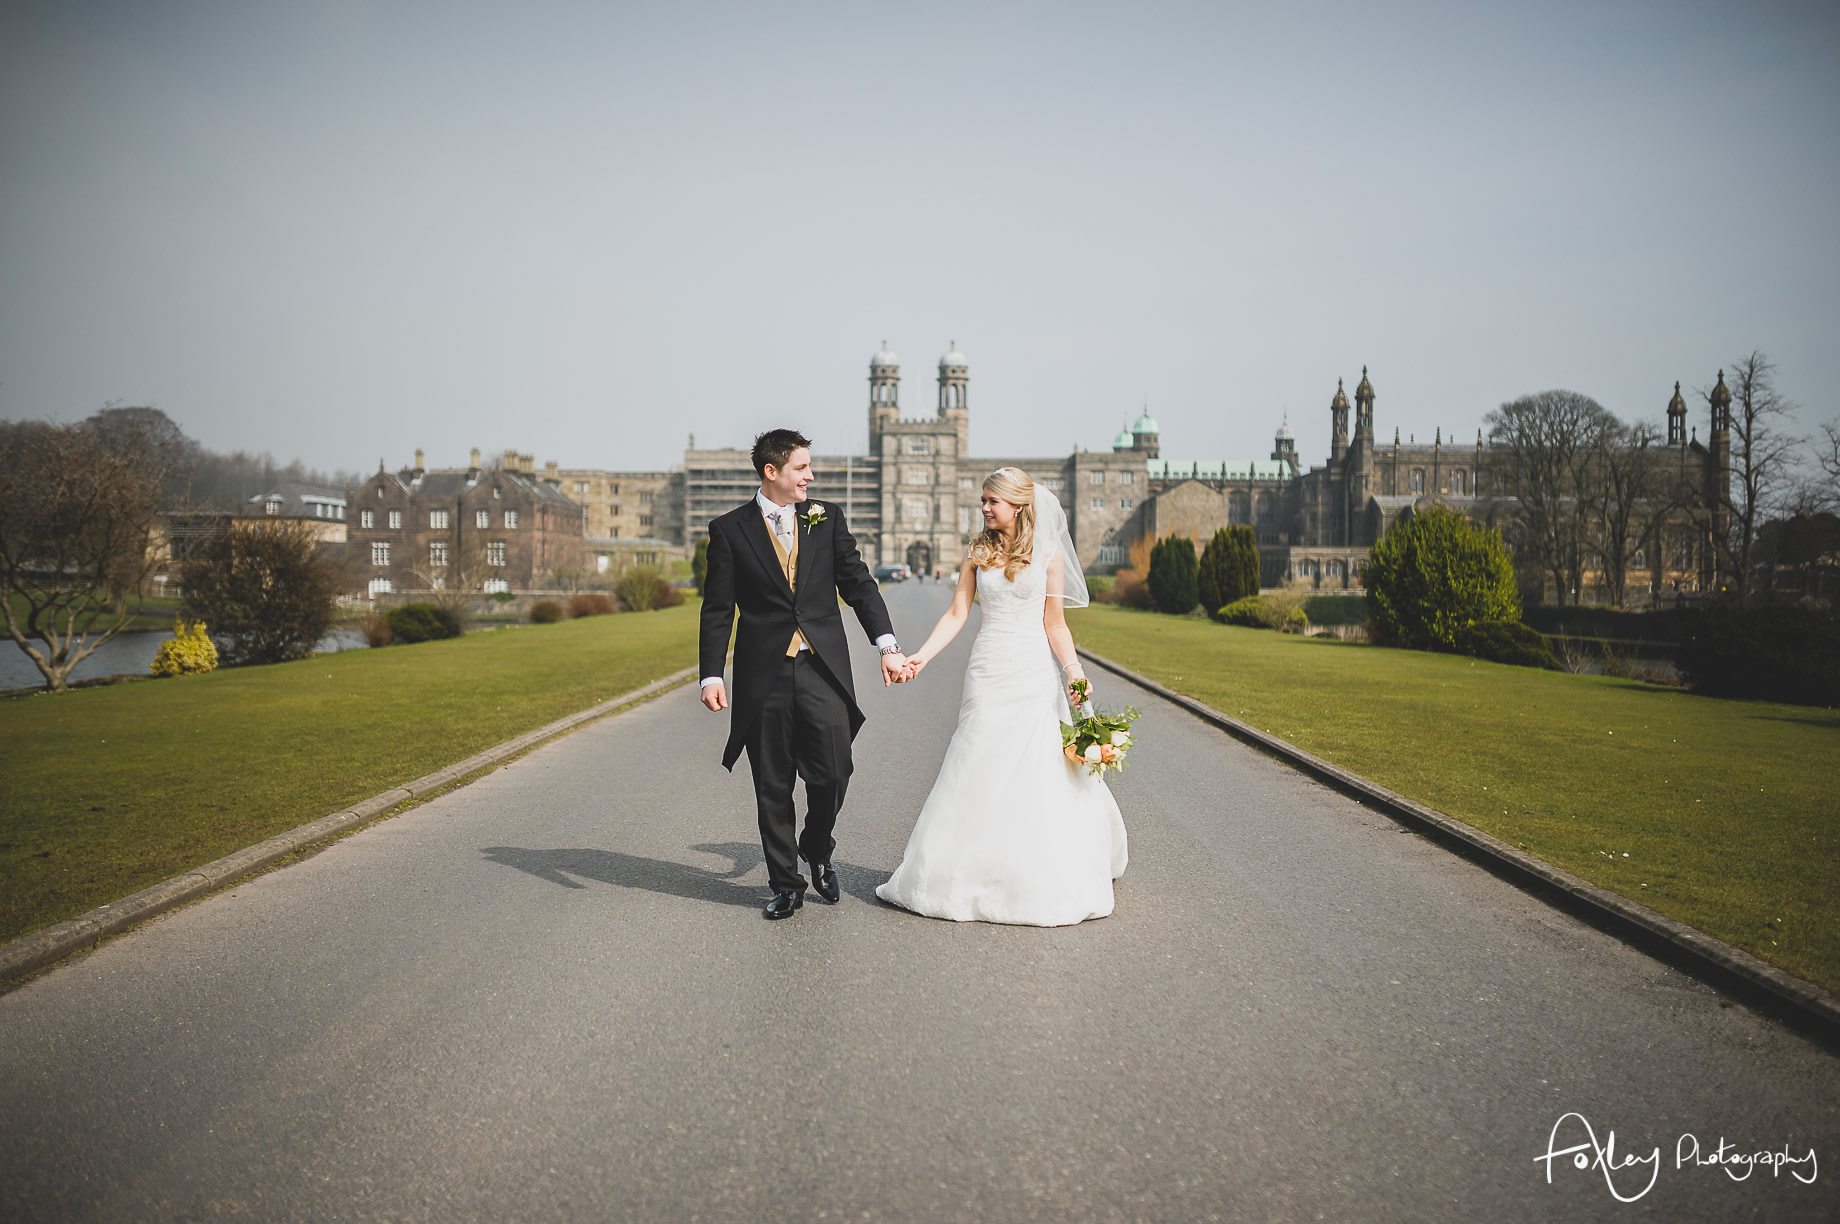 Gemma and Lewis' Wedding at Mitton Hall 092